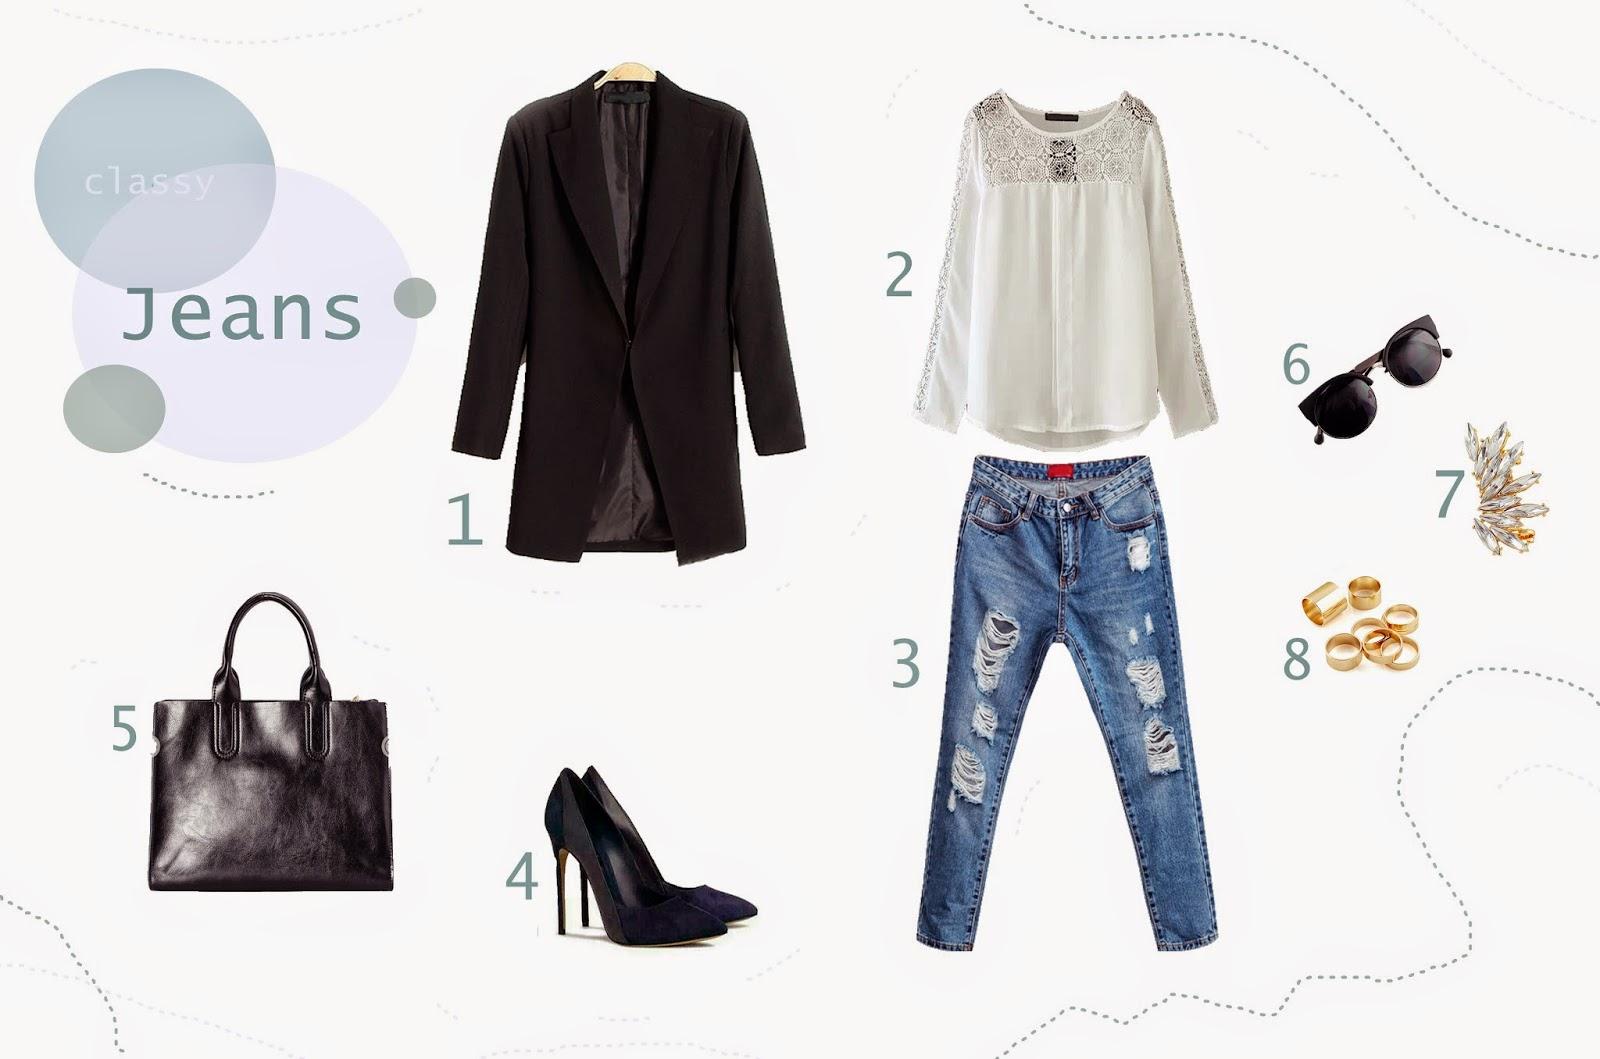 Jeans for spring - Sheinside wishlist